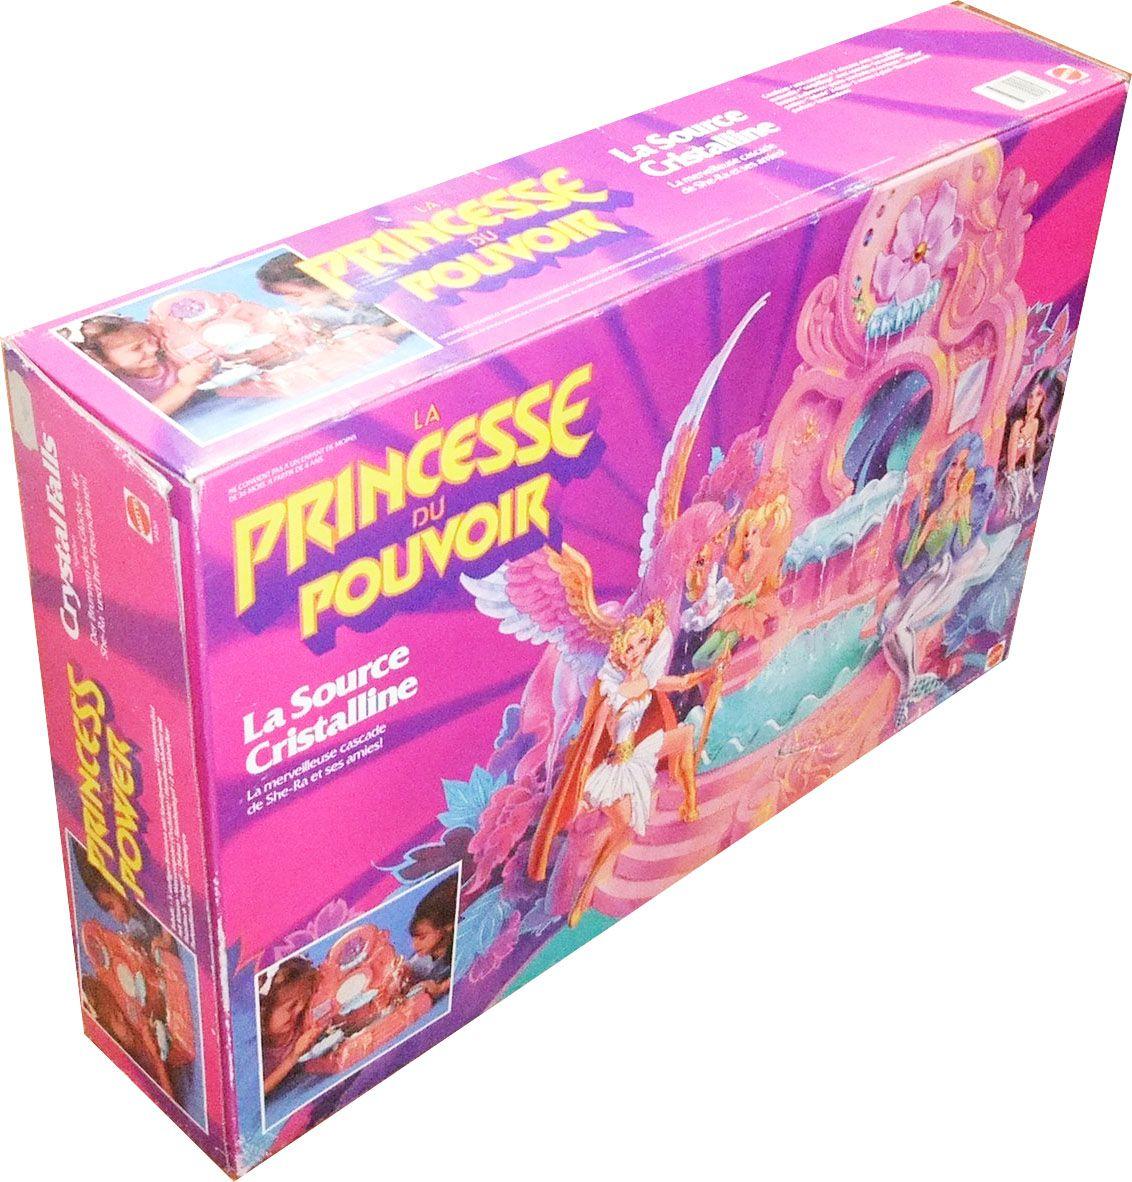 Princess of Power - Crystal Falls / Source Cristalline (boite Europe)